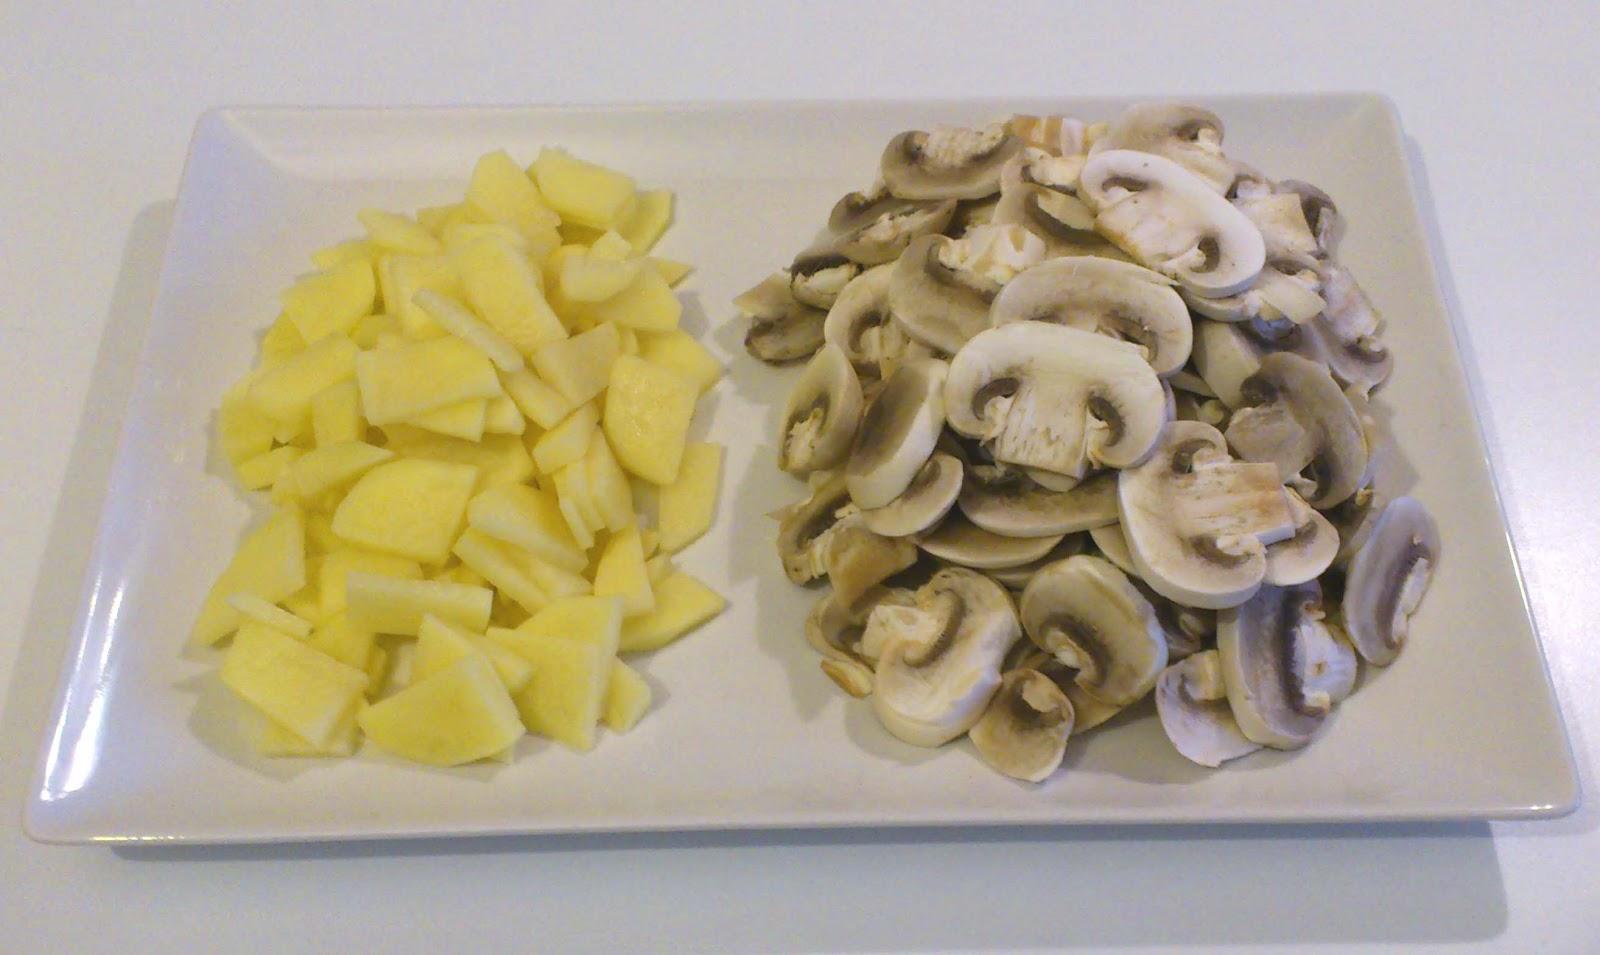 patata y champiñones